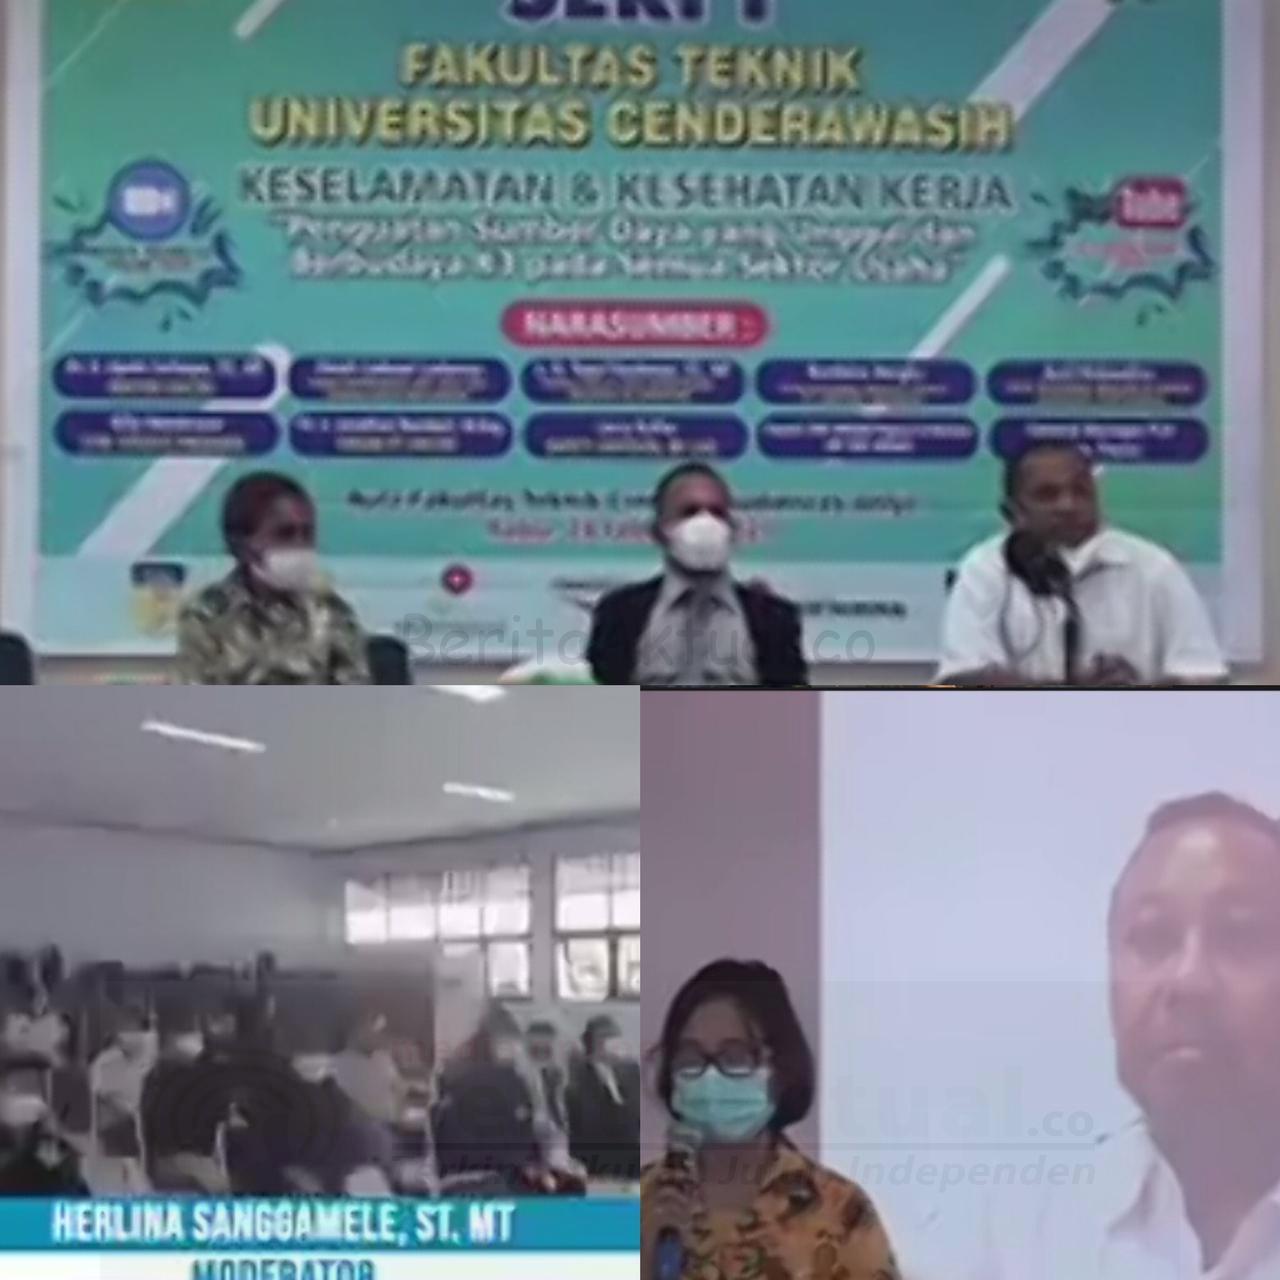 Industri Hulu Migas Wil Papua Maluku Dukung Pencanangan Bulan K3 Bersama Civitas Akademika Uncen 2 IMG 20210225 WA0000